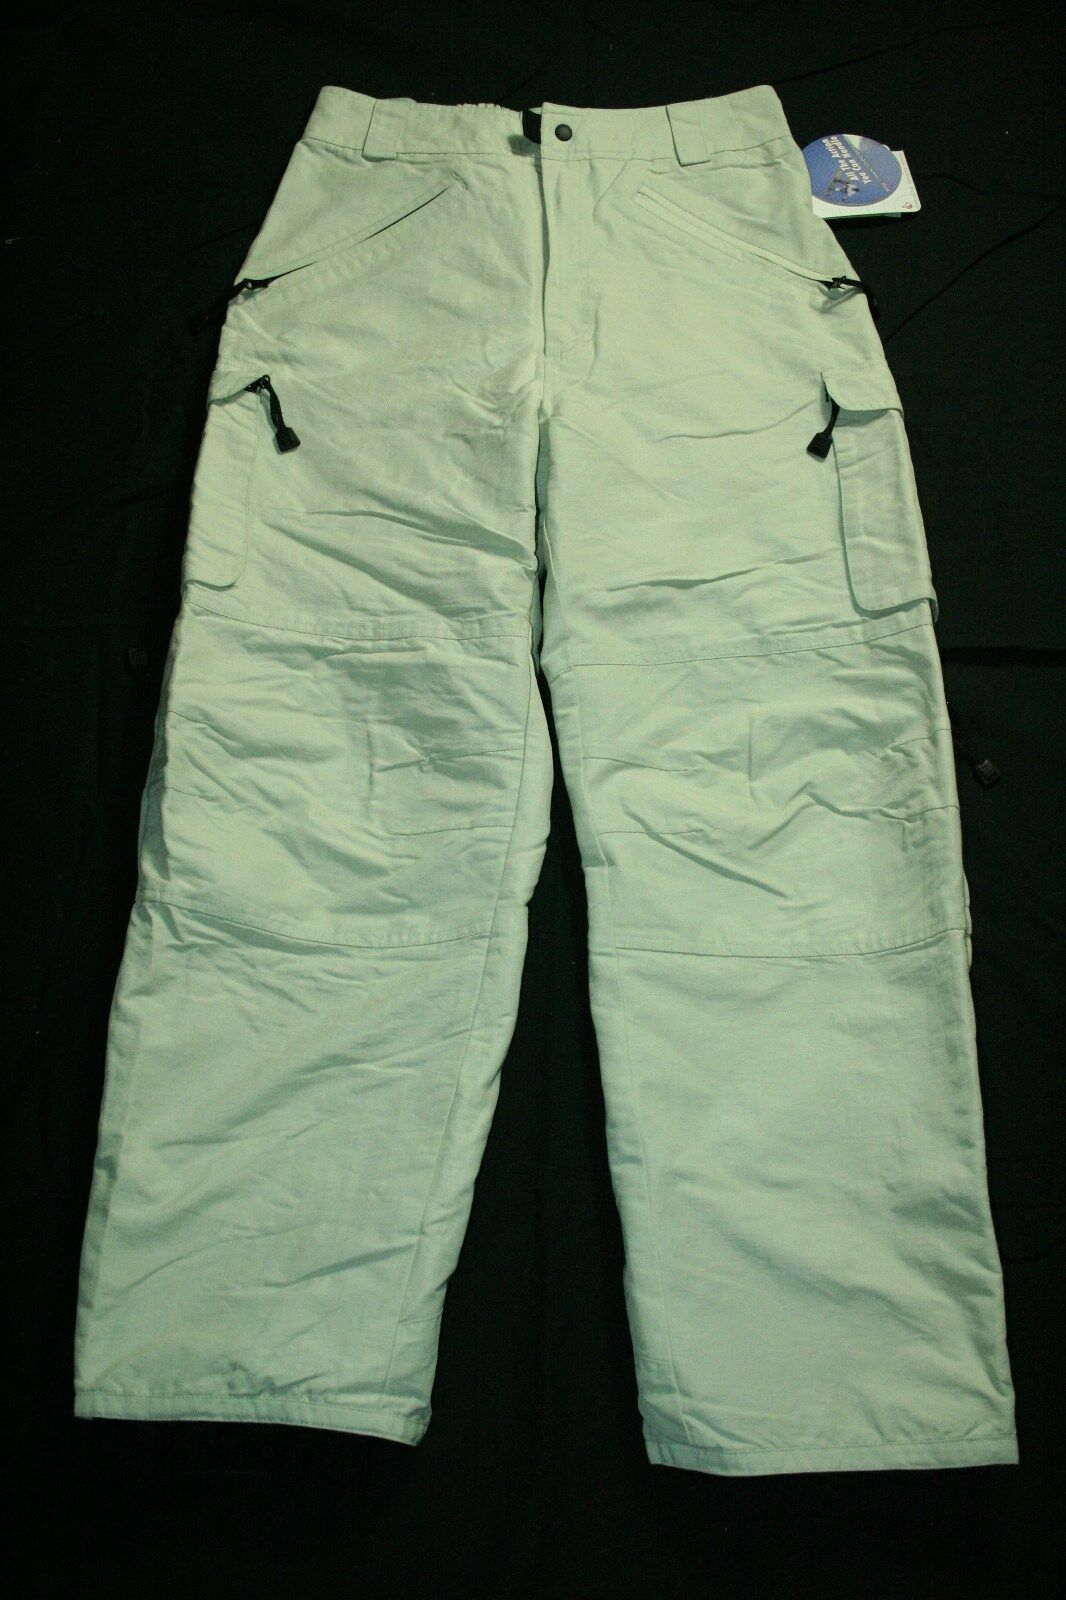 Mens Drift Performance Boardwear Ski Snowboard Pants Cargo size L NWT